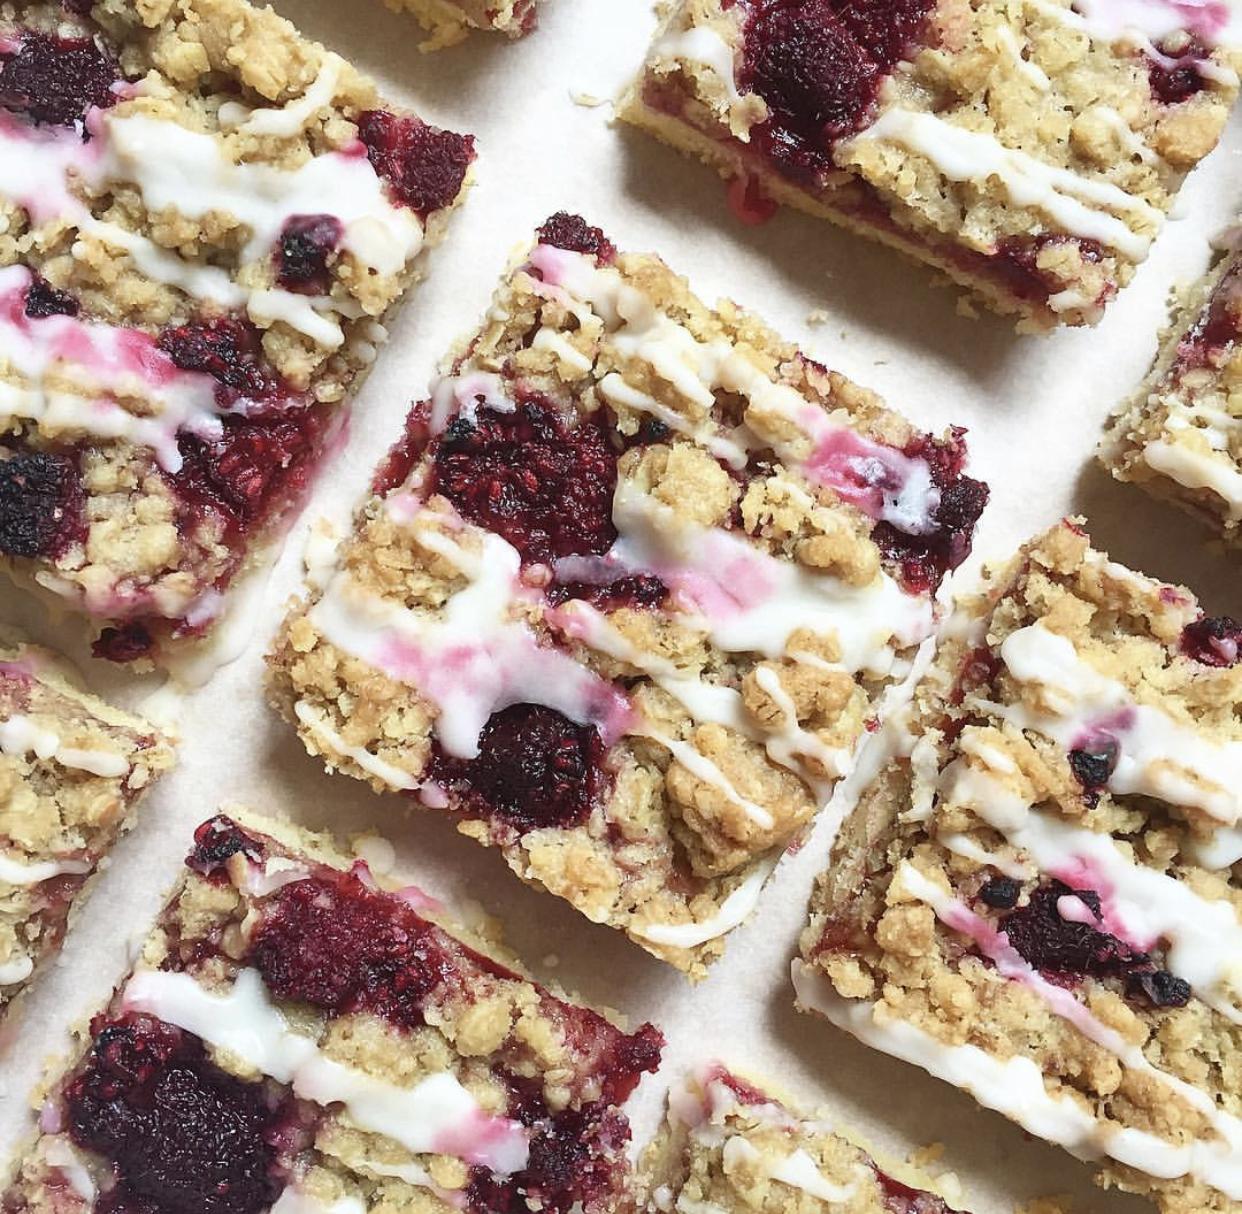 Recipe for Raspberry Crumble Bars